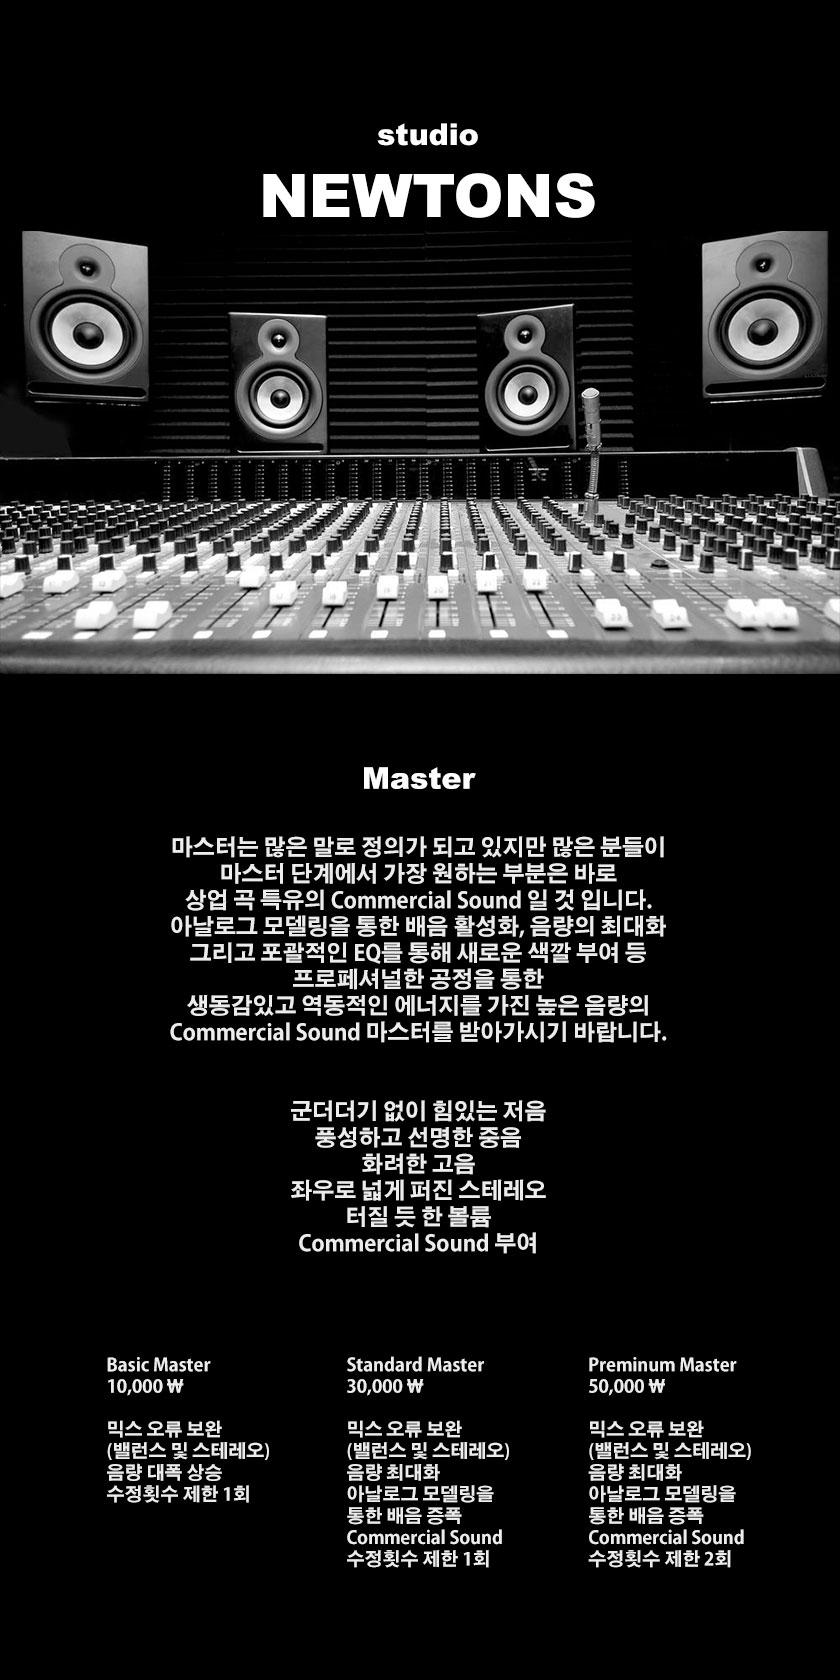 studioNEWTONSmaster.jpg